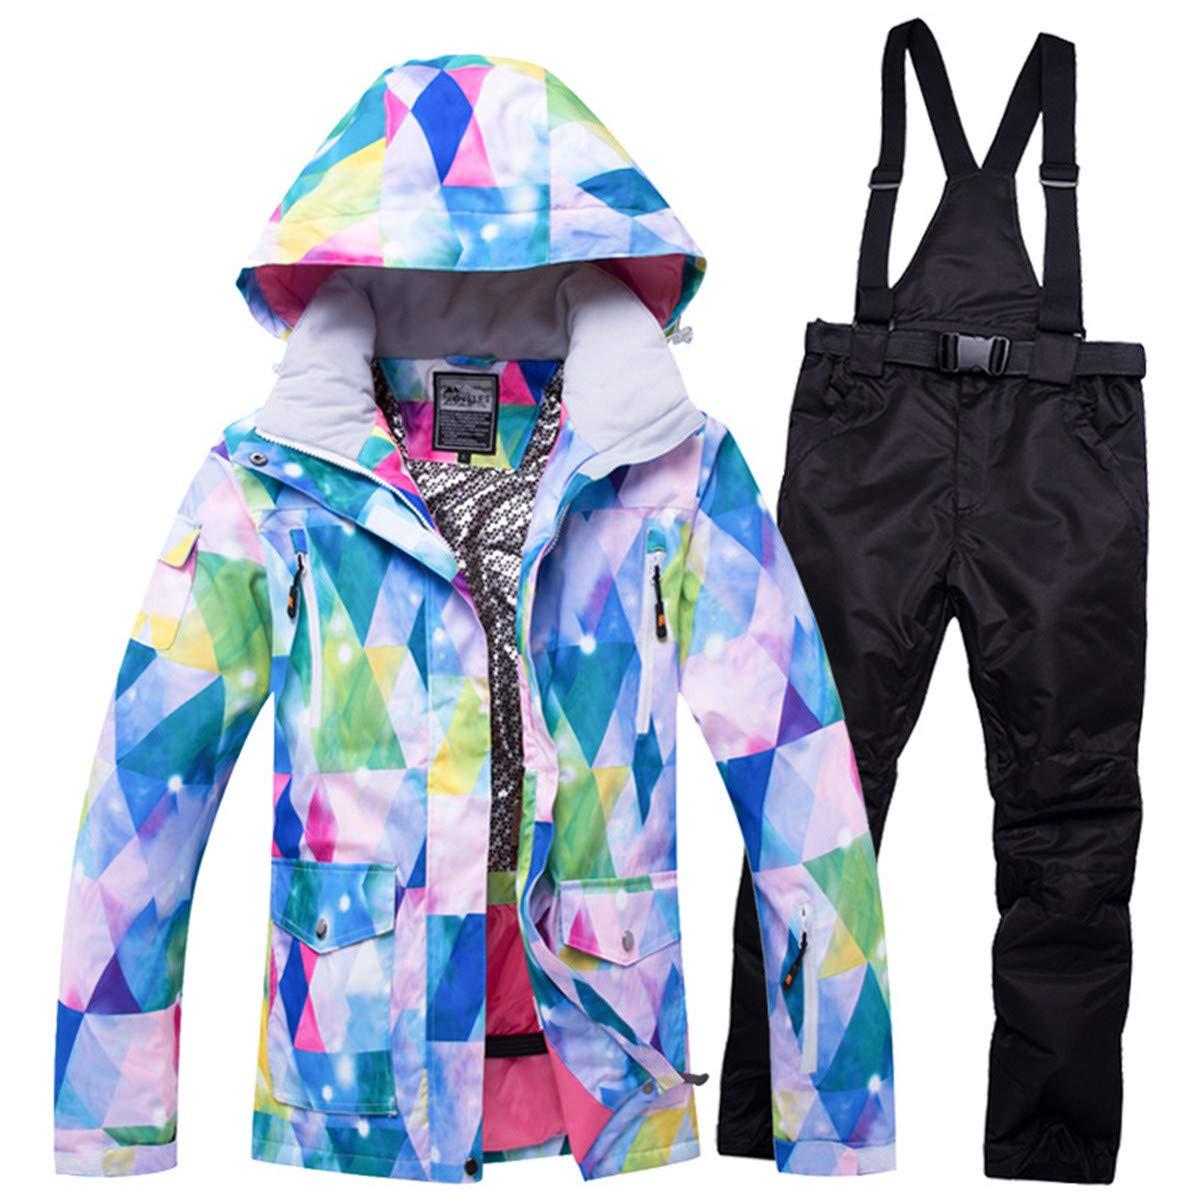 Snow 7 REWANGOING Women's Ski Bib Suit Winter Warm Jacket Waterproof Snowboard colorful Printed Ski Jacket and Pants Set